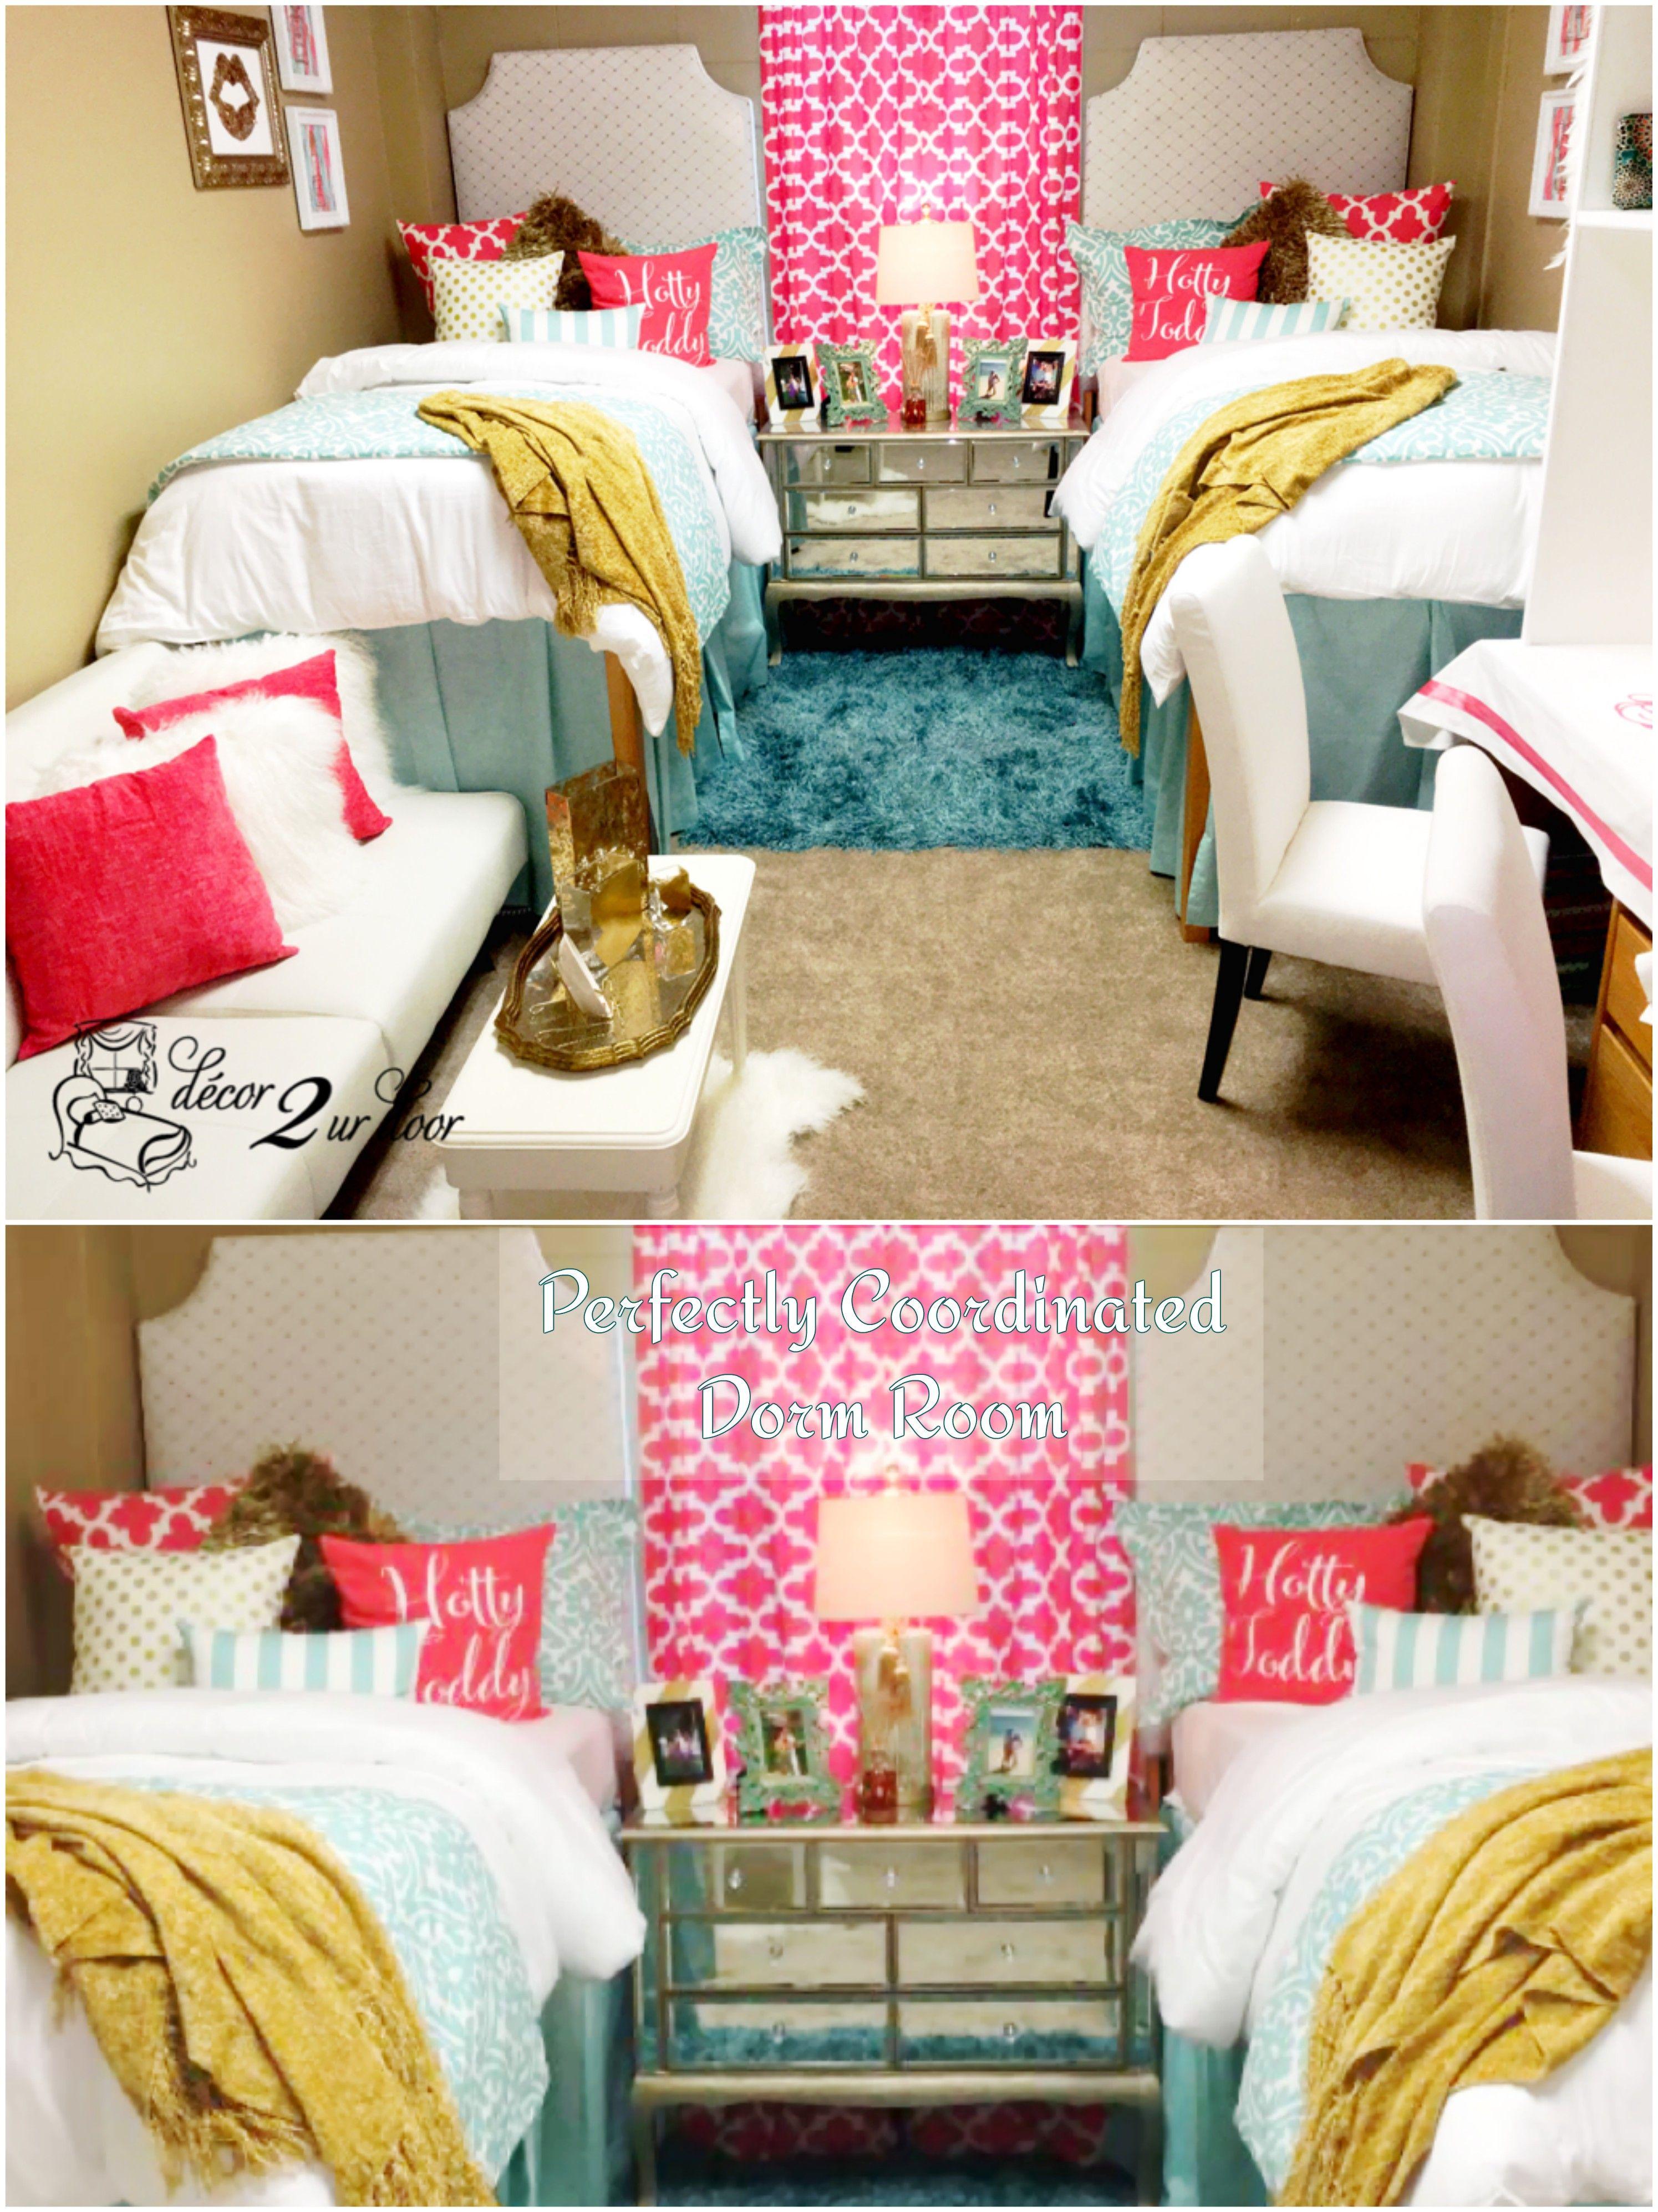 colorado rooms university pin of bedding dorm baker room at boulder